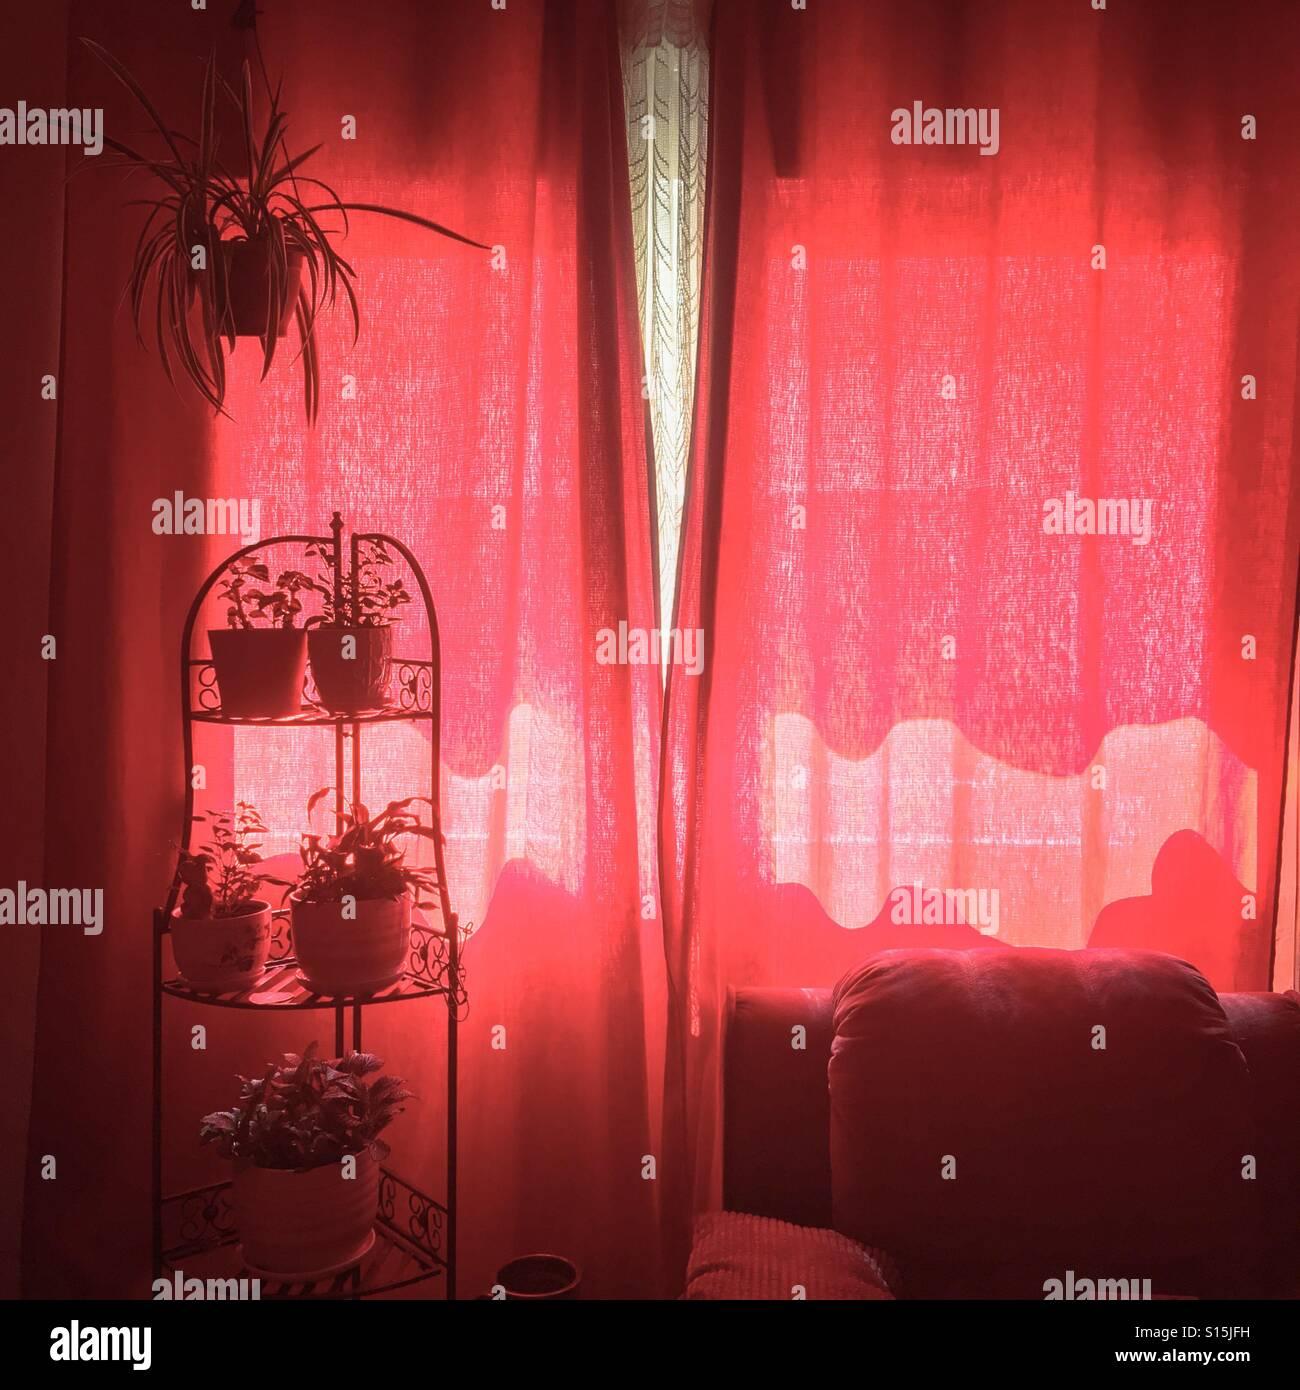 rote vorh nge wohnzimmer stockfoto bild 310525589 alamy. Black Bedroom Furniture Sets. Home Design Ideas